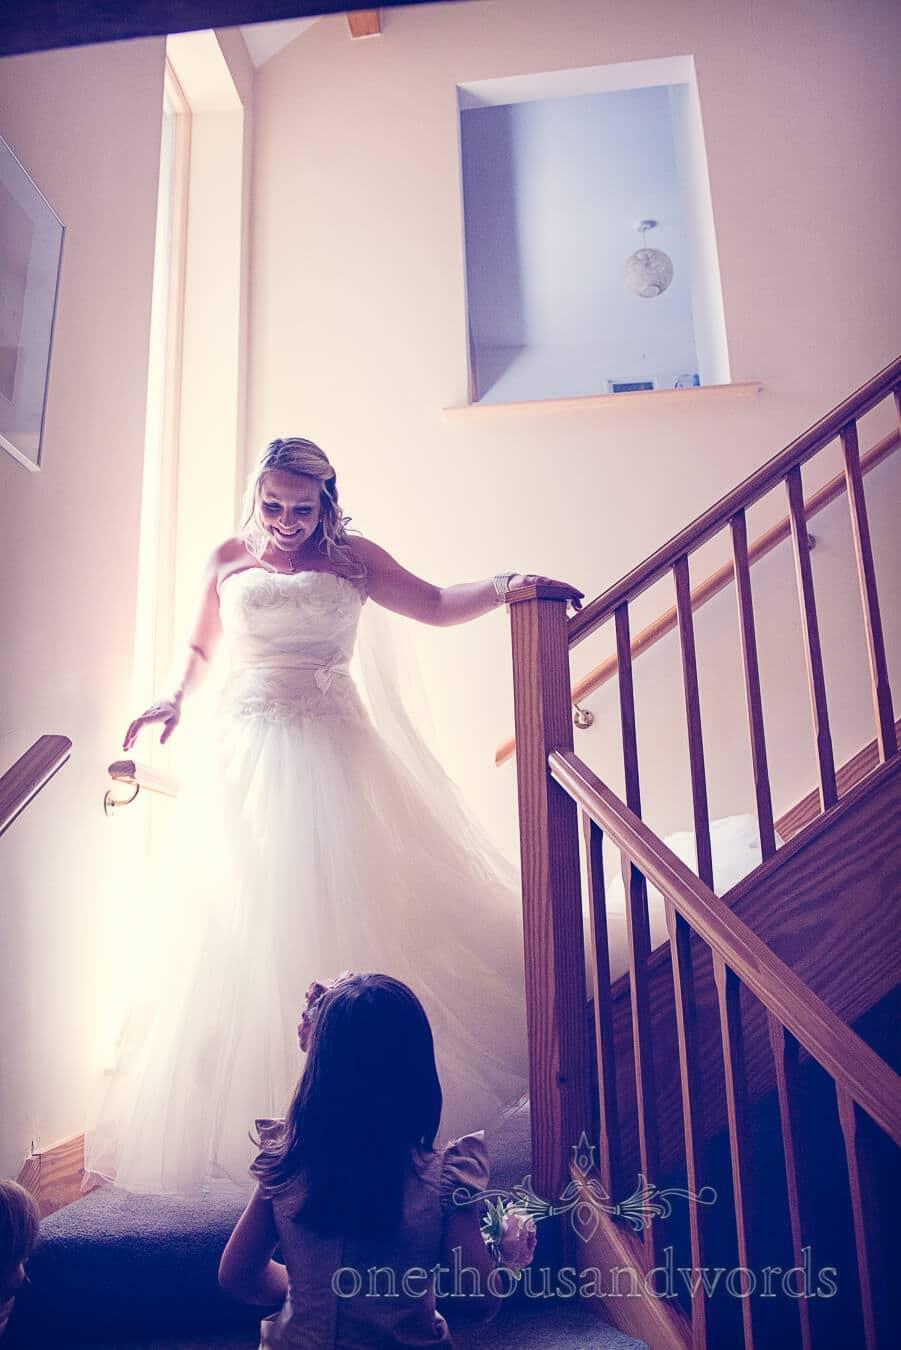 Bride in wedding dress decends stairs at Dorset Home Wedding